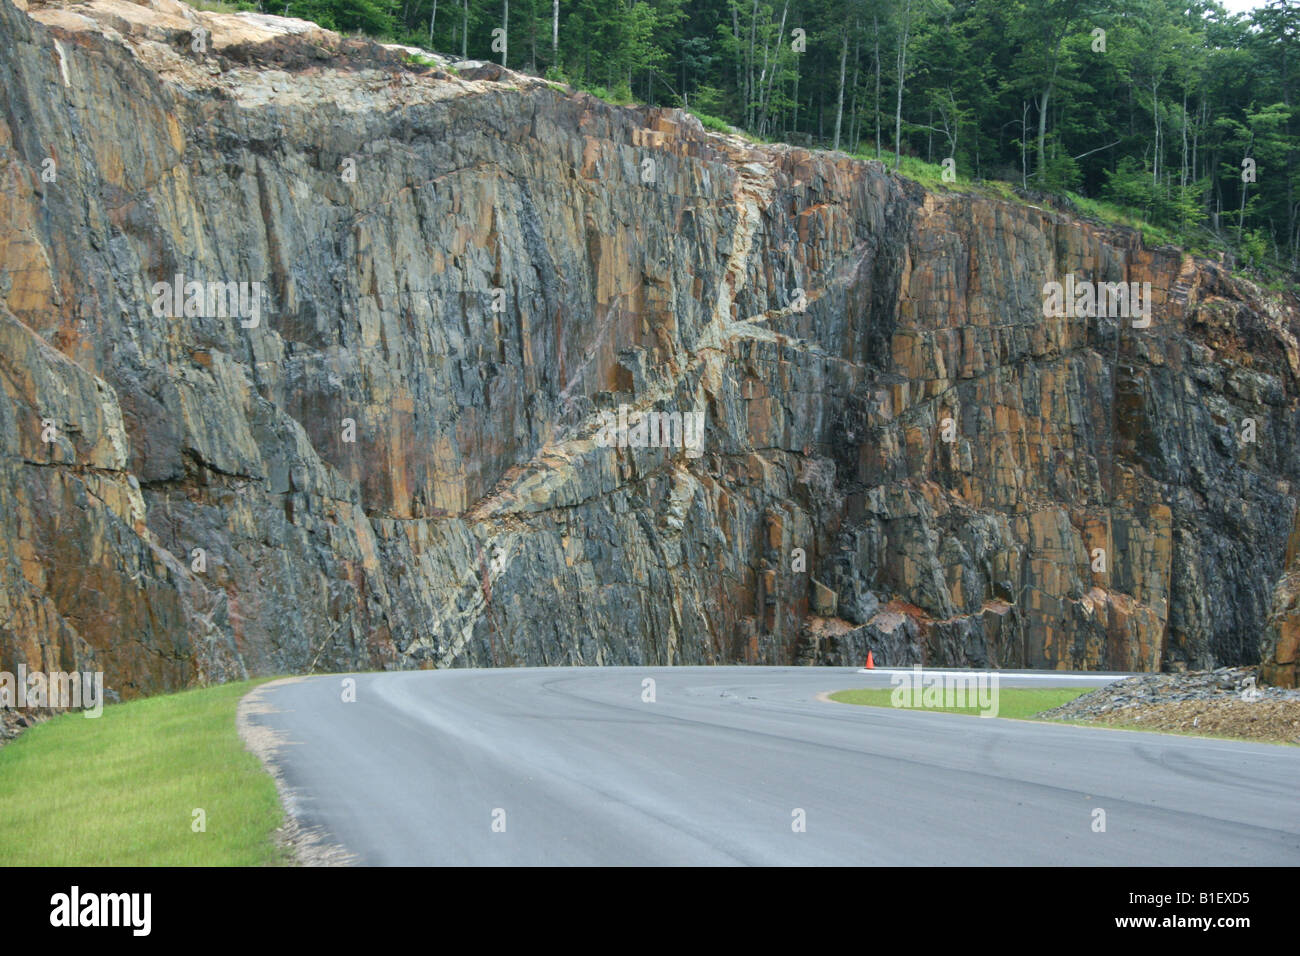 Intrusions Dike & Sill Interstate 80 New Jersey - Stock Image